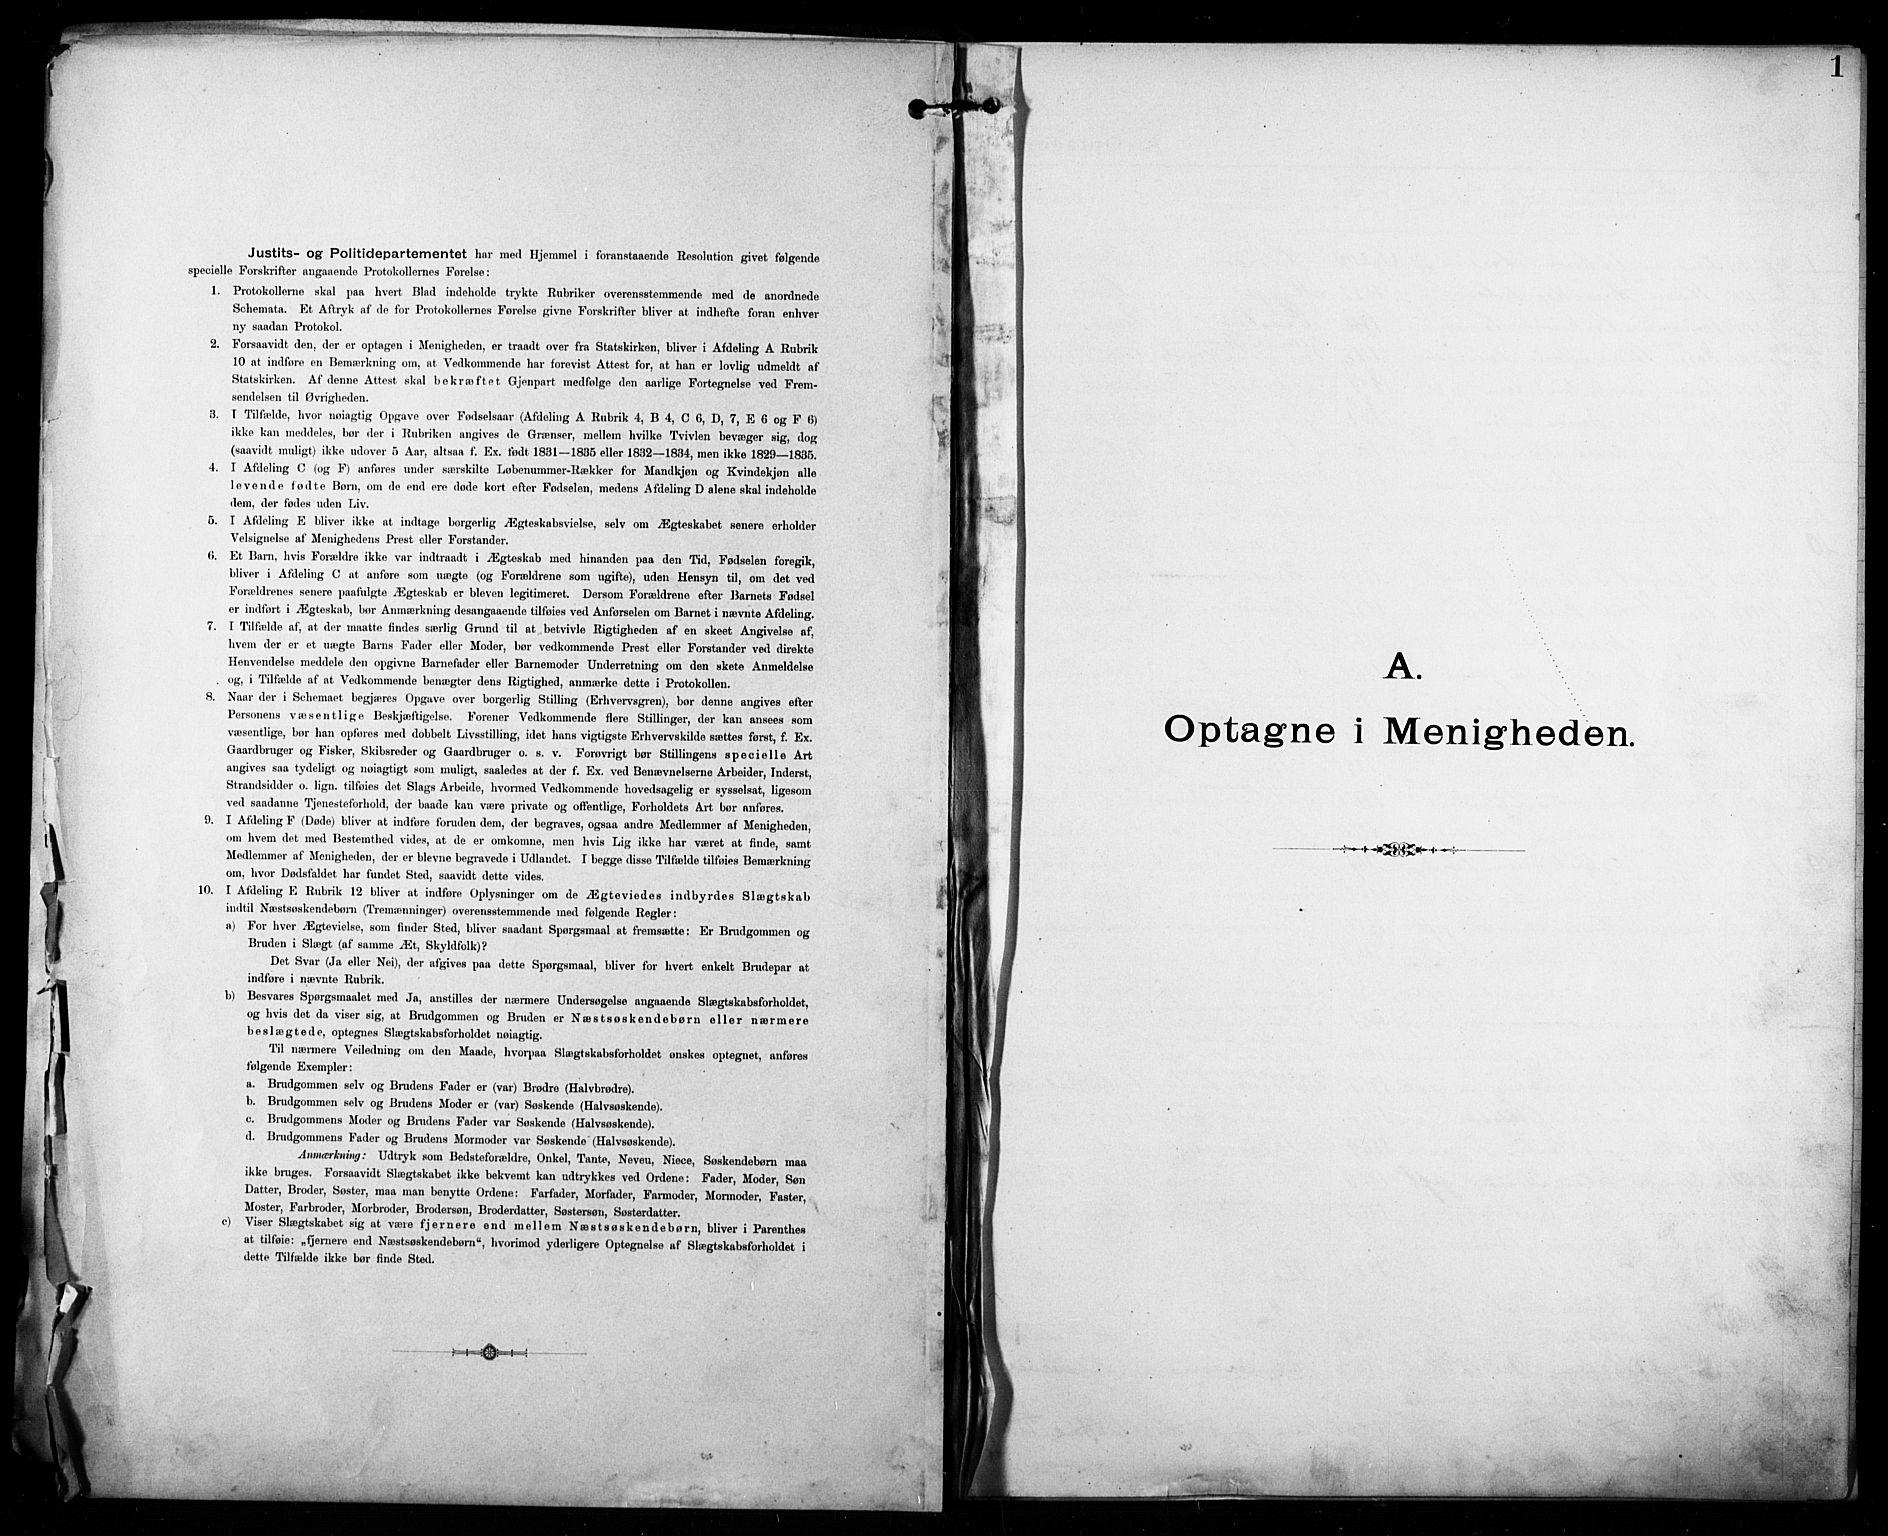 SAO, Kristi menighet Fredrikstad , A/L0001: Dissenterprotokoll nr. 1, 1893-1914, s. 1